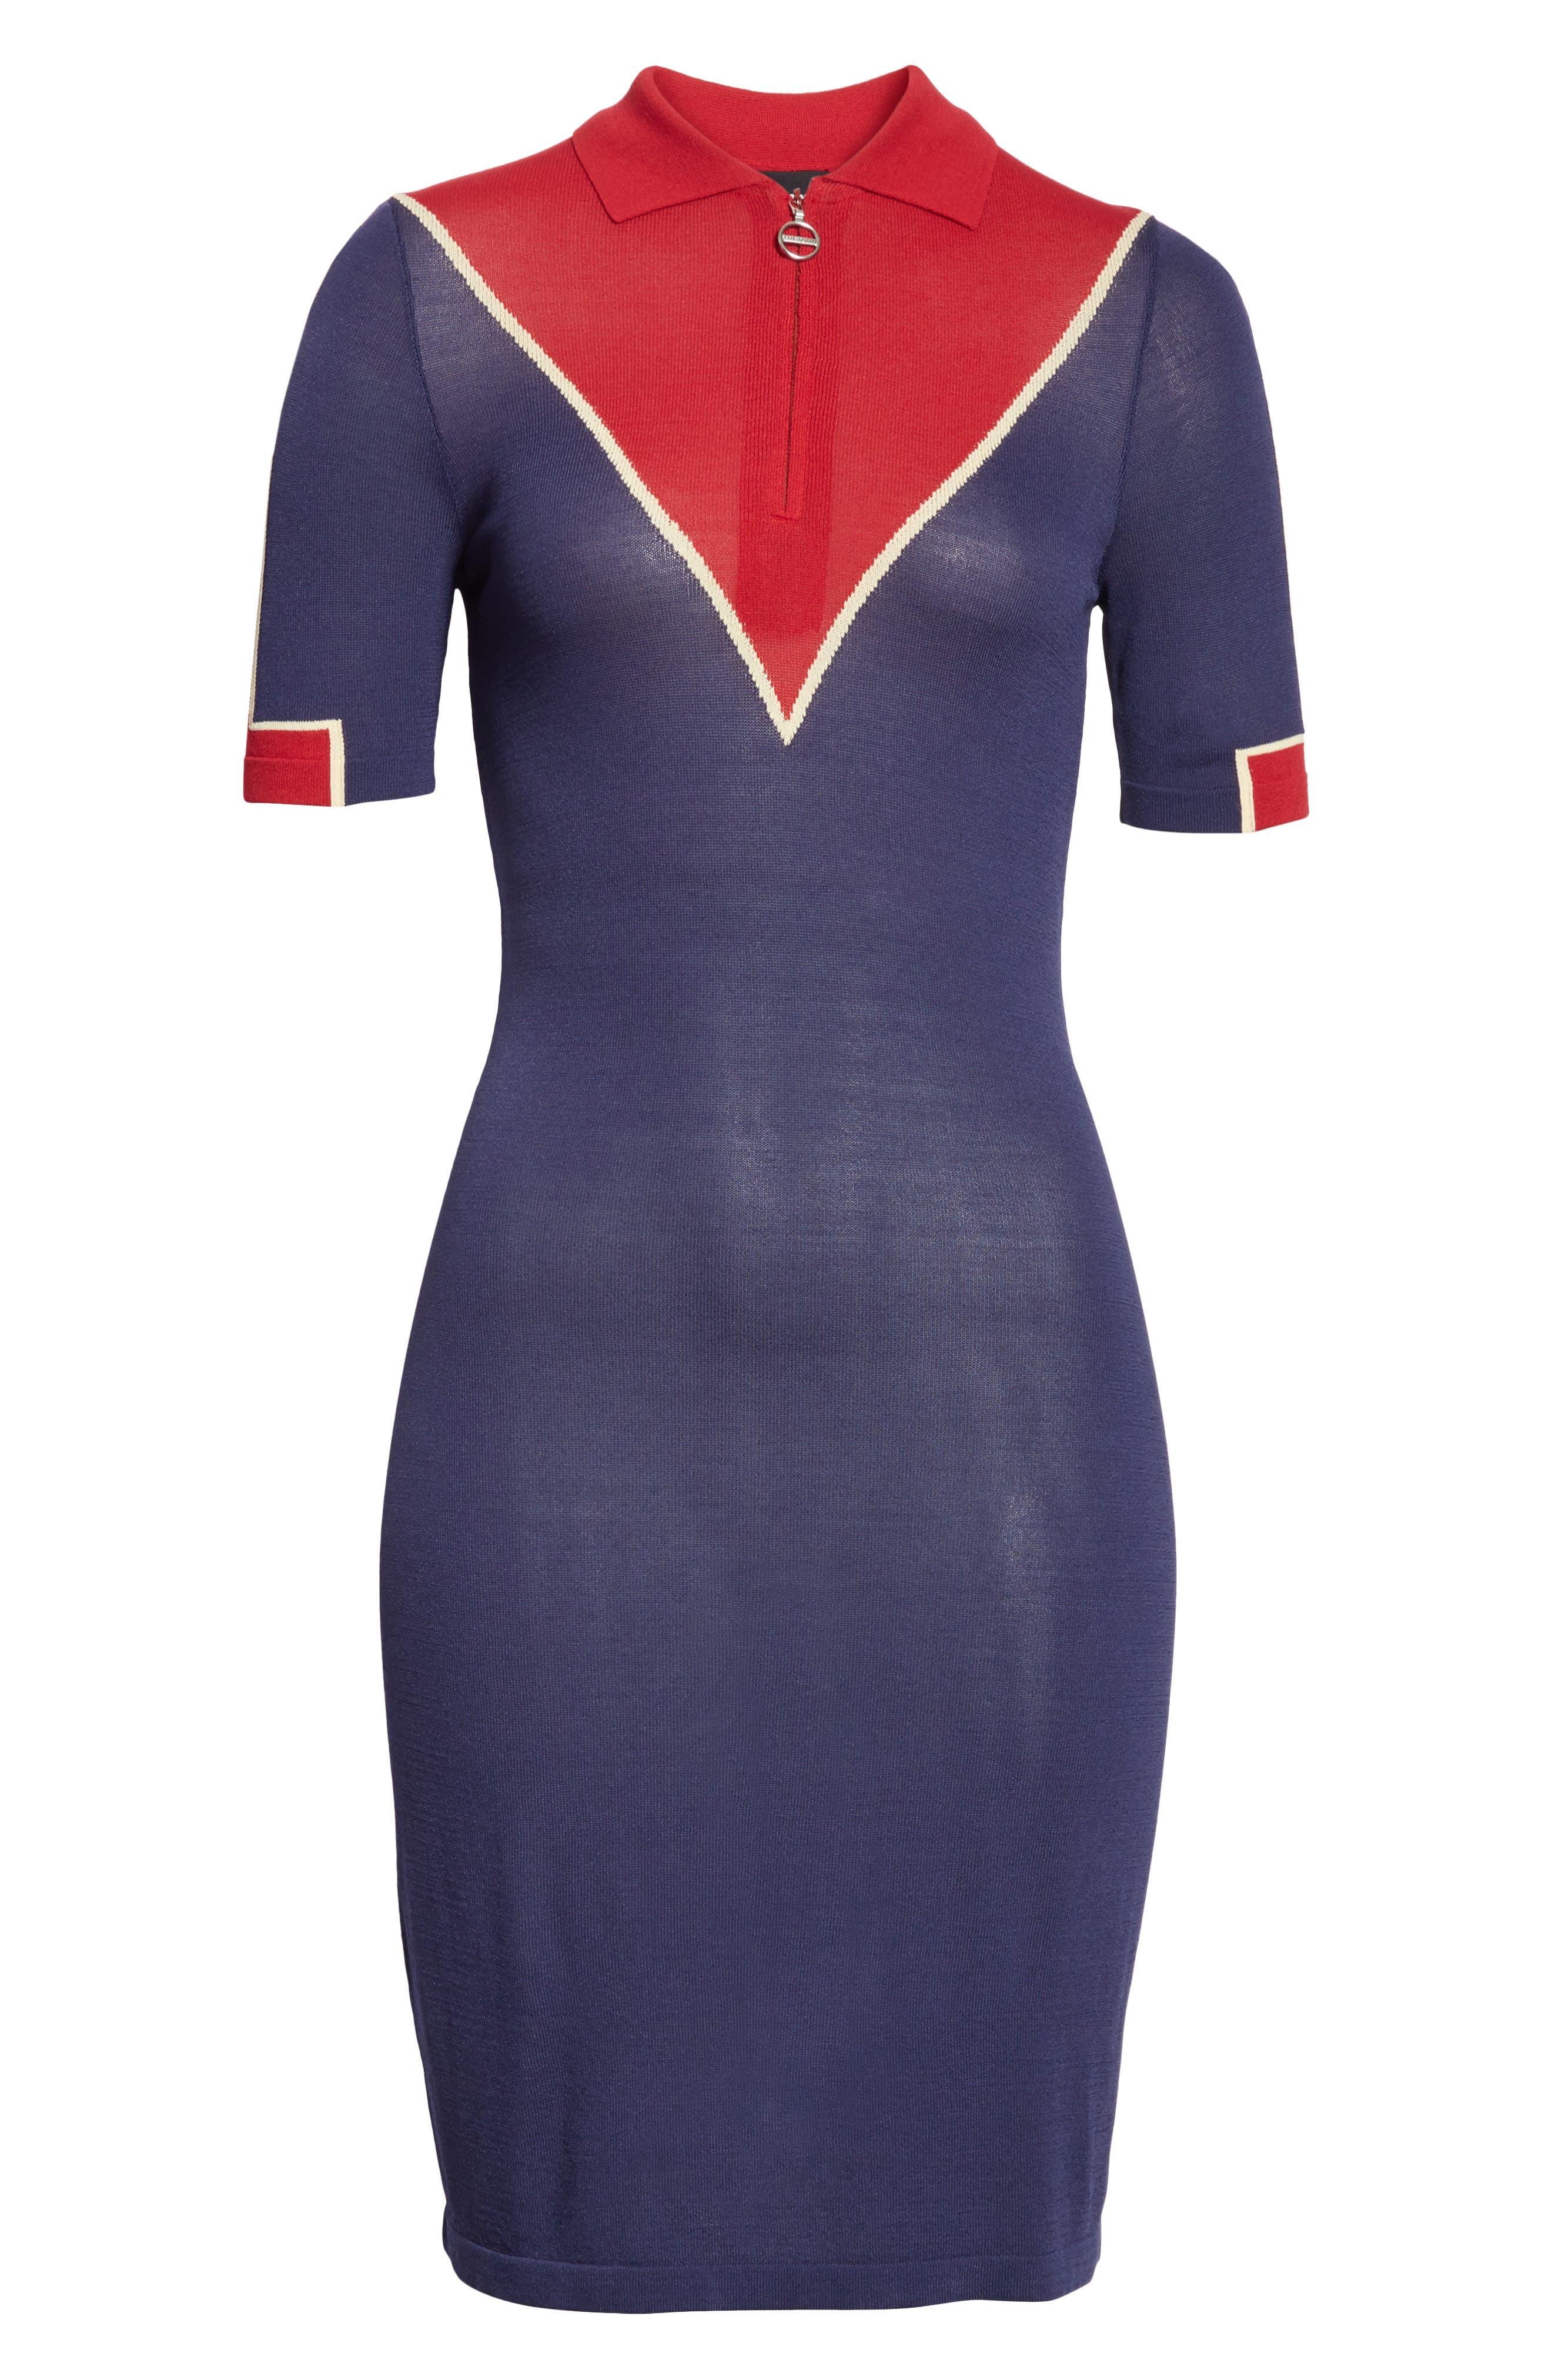 Chevron Knit Dress,                             Alternate thumbnail 6, color,                             Navy